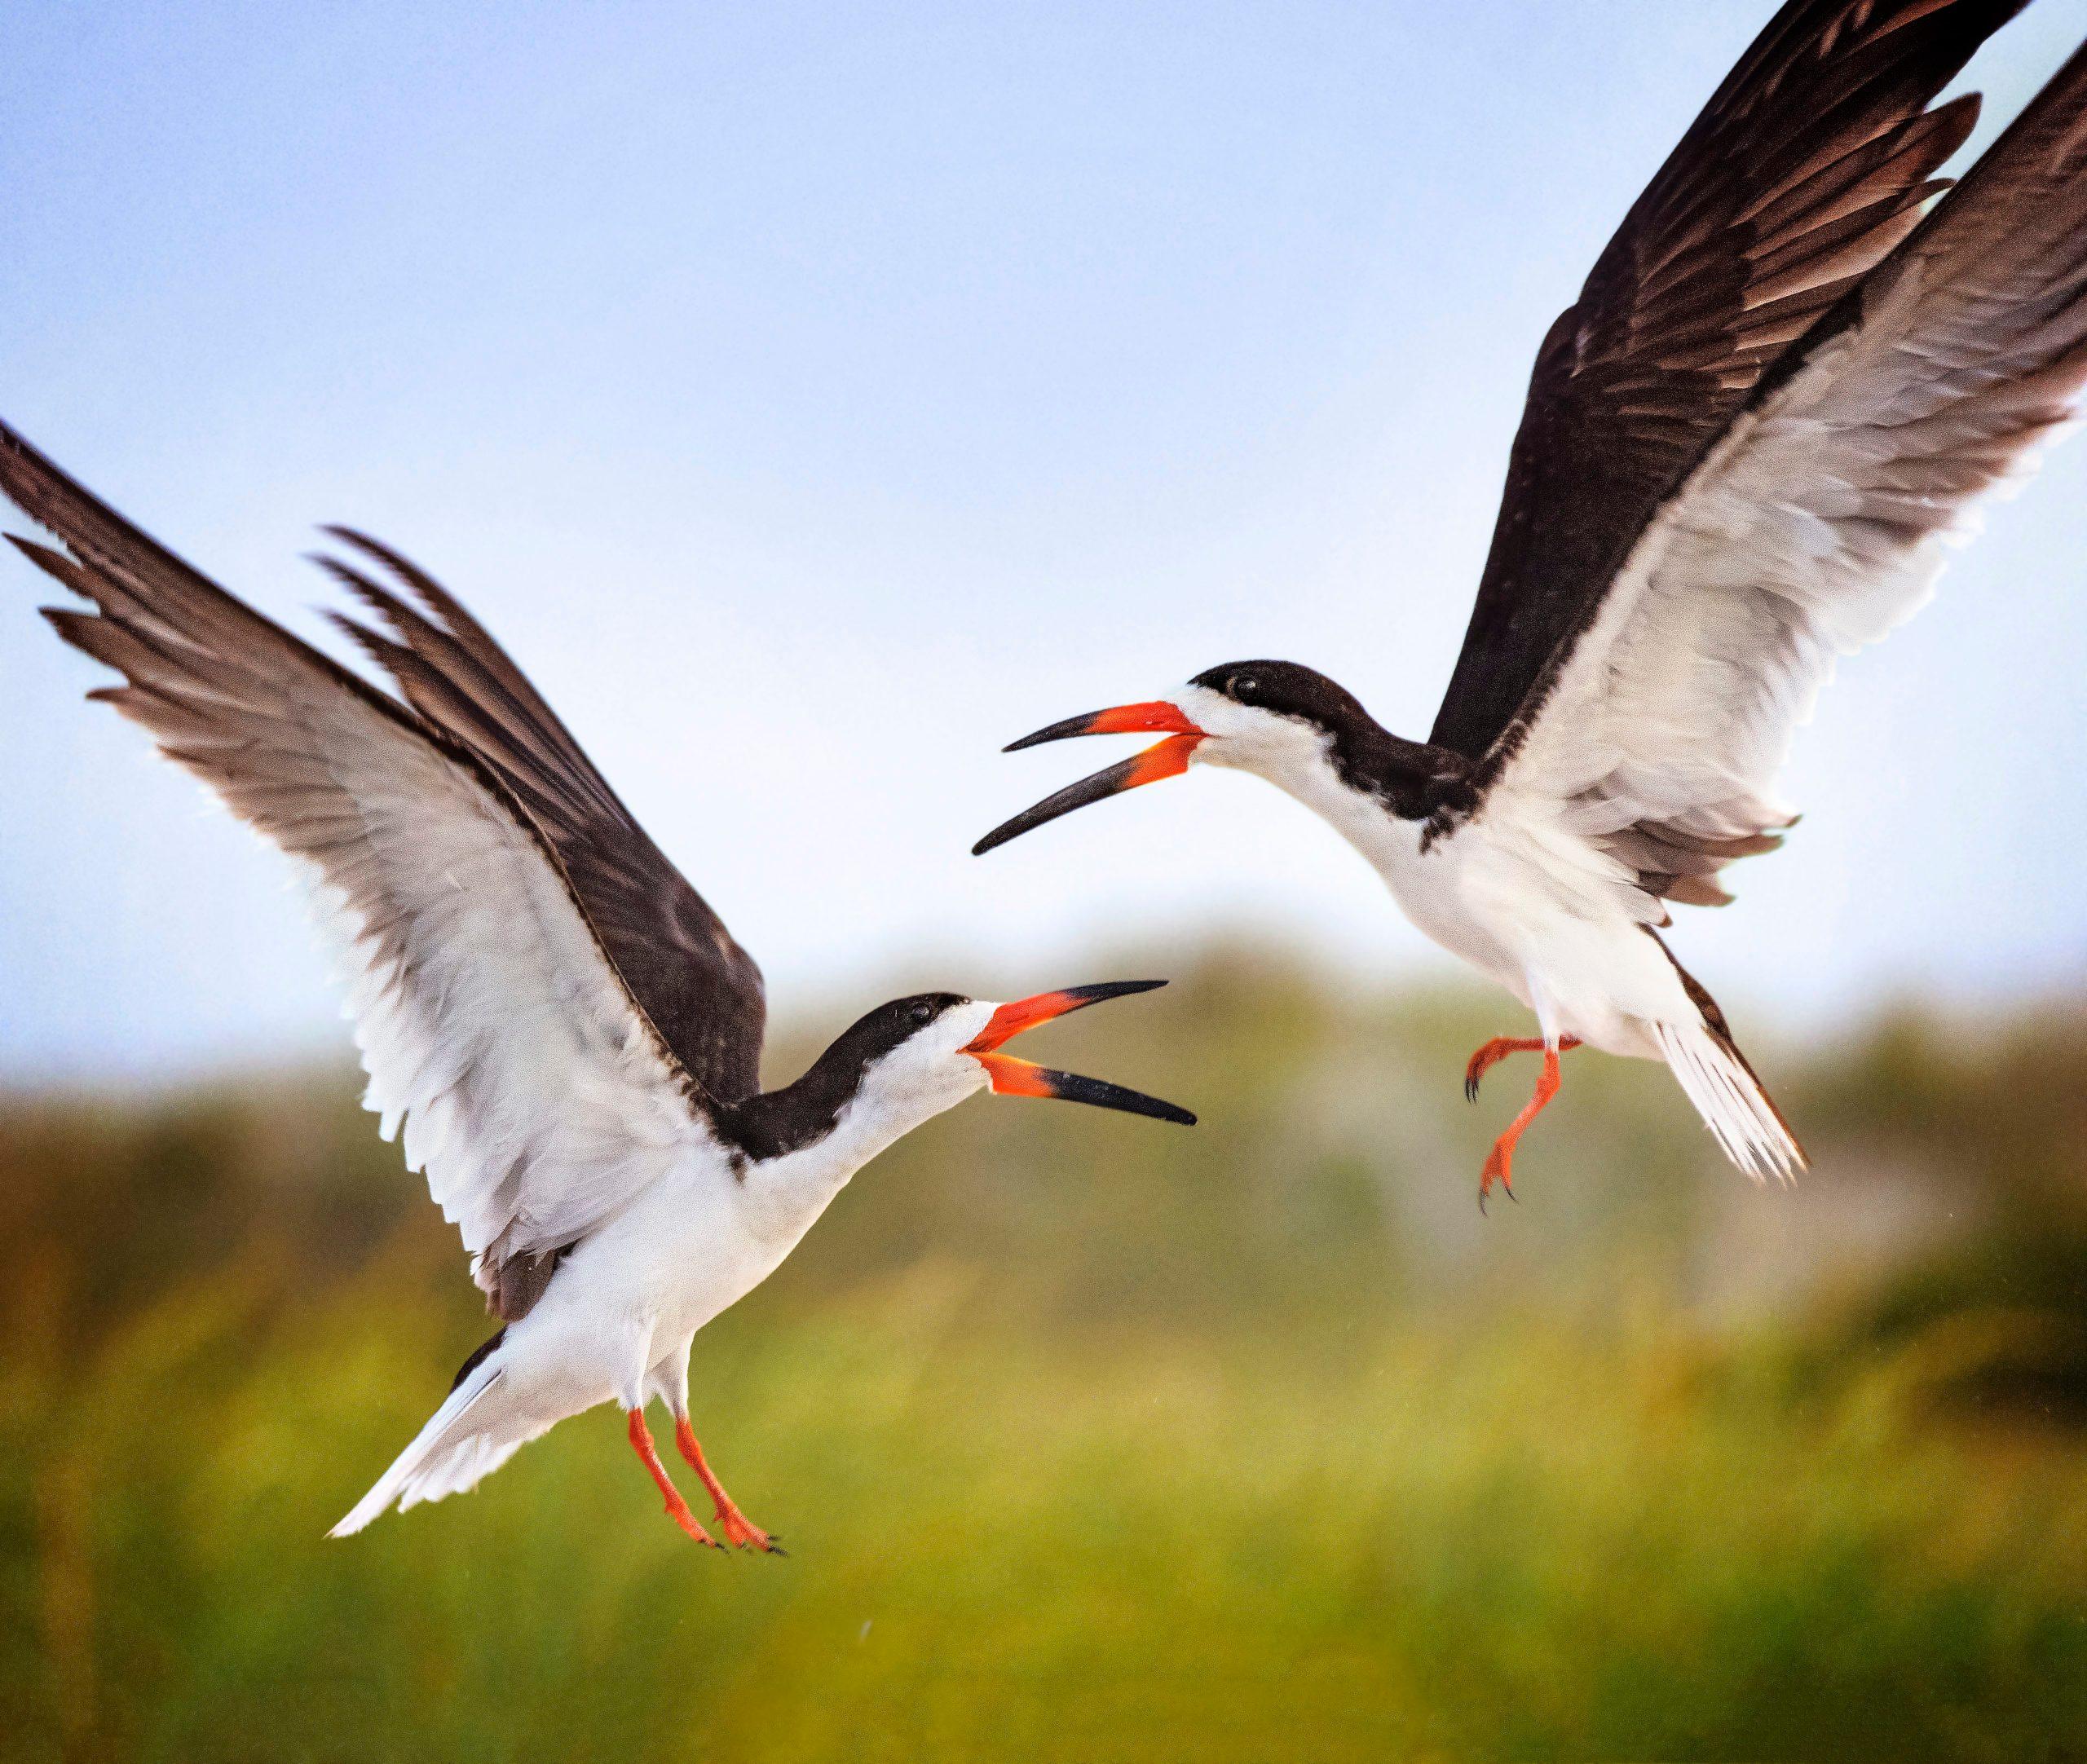 A pair of black skimmers in flight.